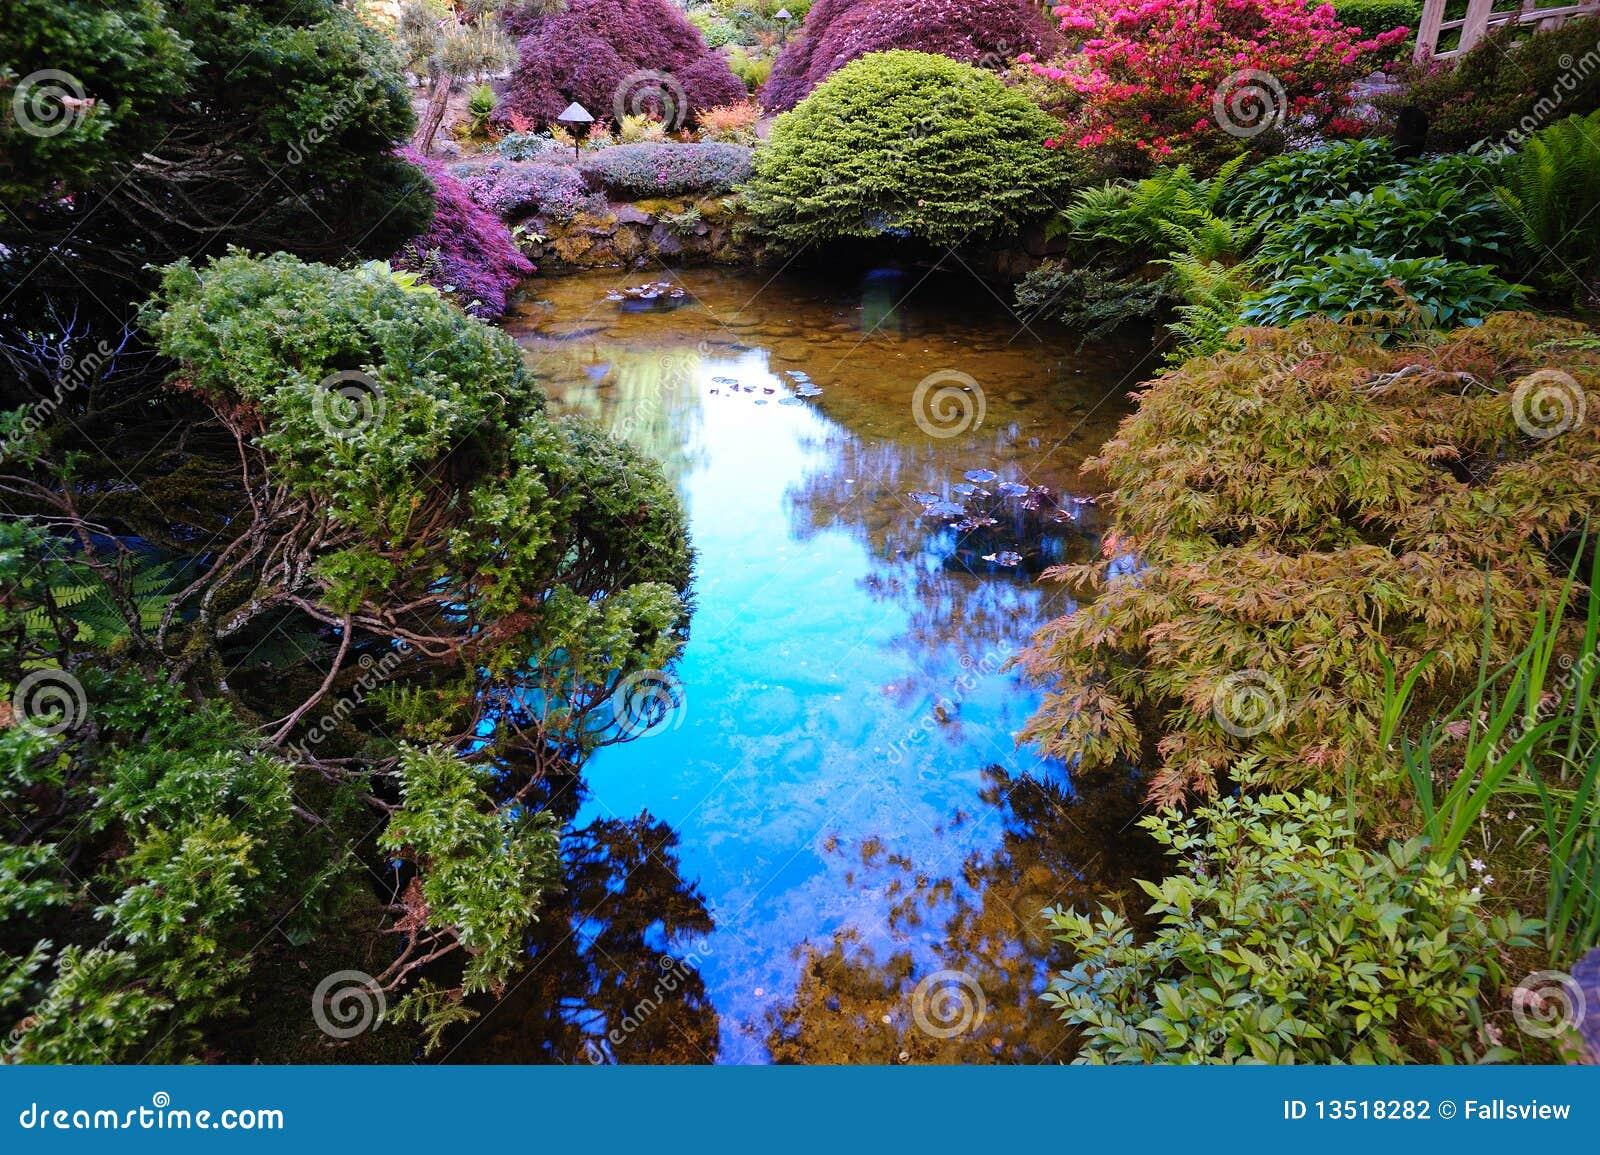 Japanese garden pond stock photography image 13518282 for Japanese garden pool